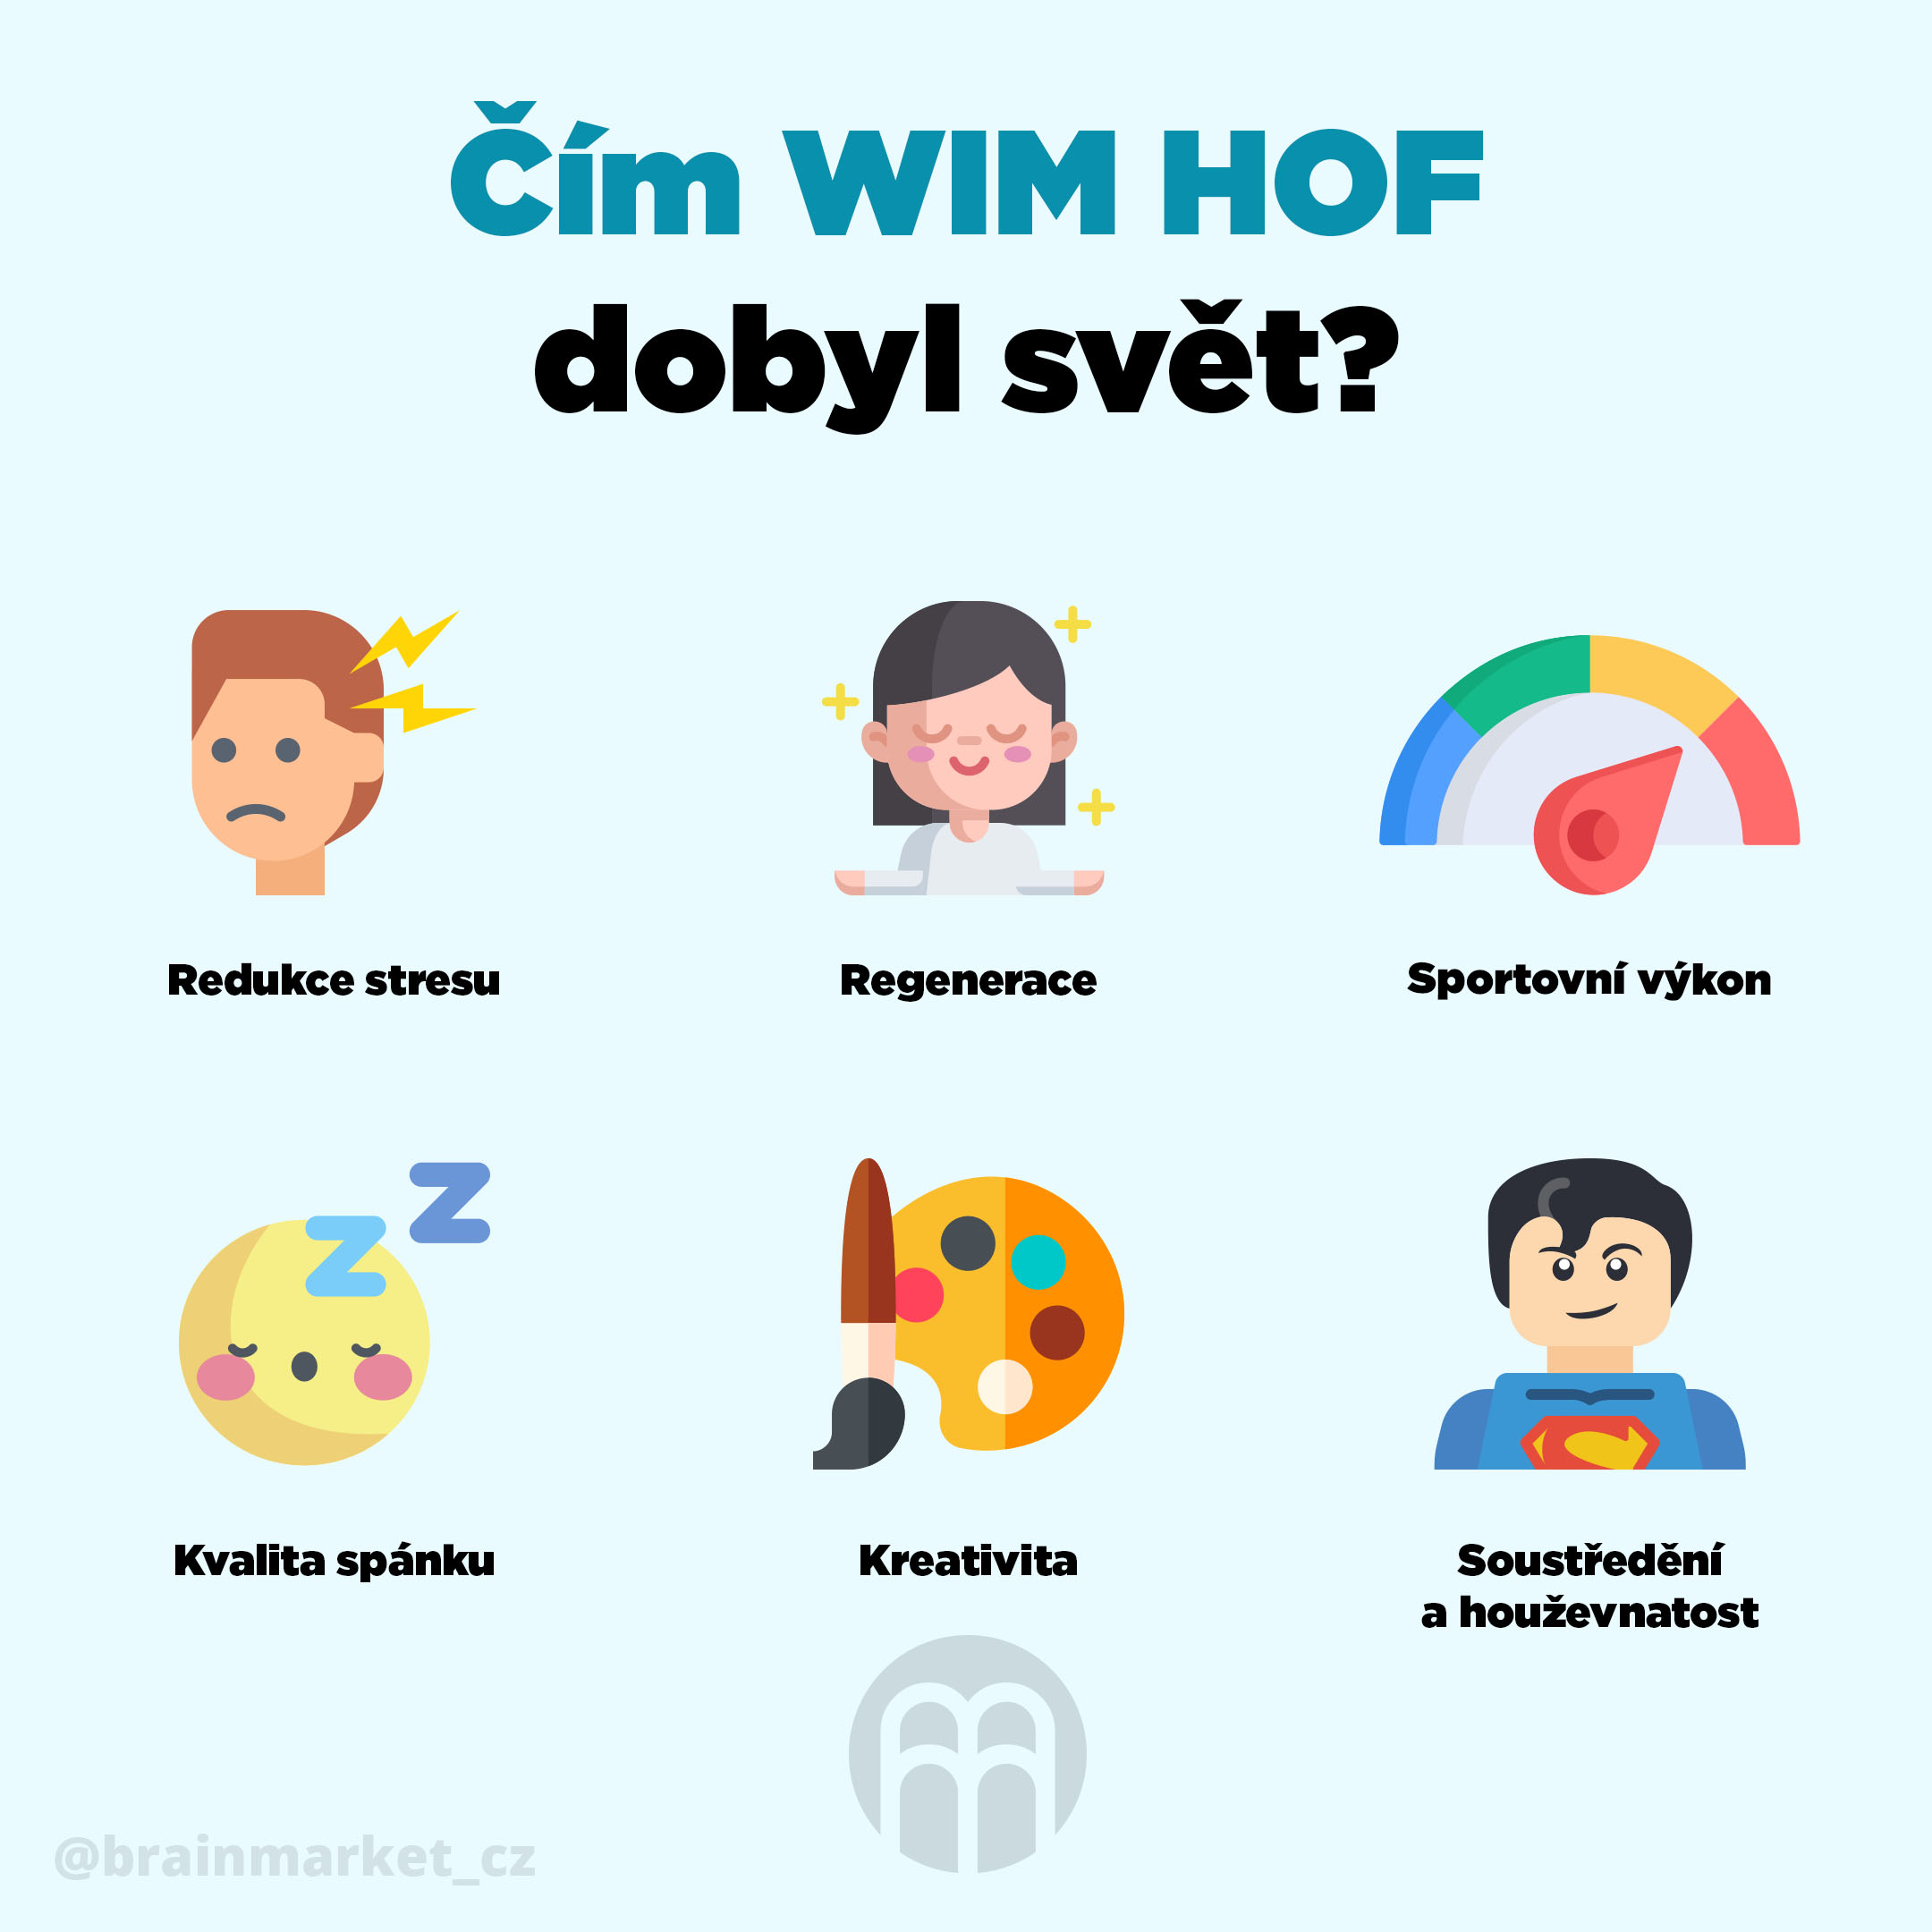 cim_wim_hof_dobyl_svet_Infografika-BrainMarket-2_CZ